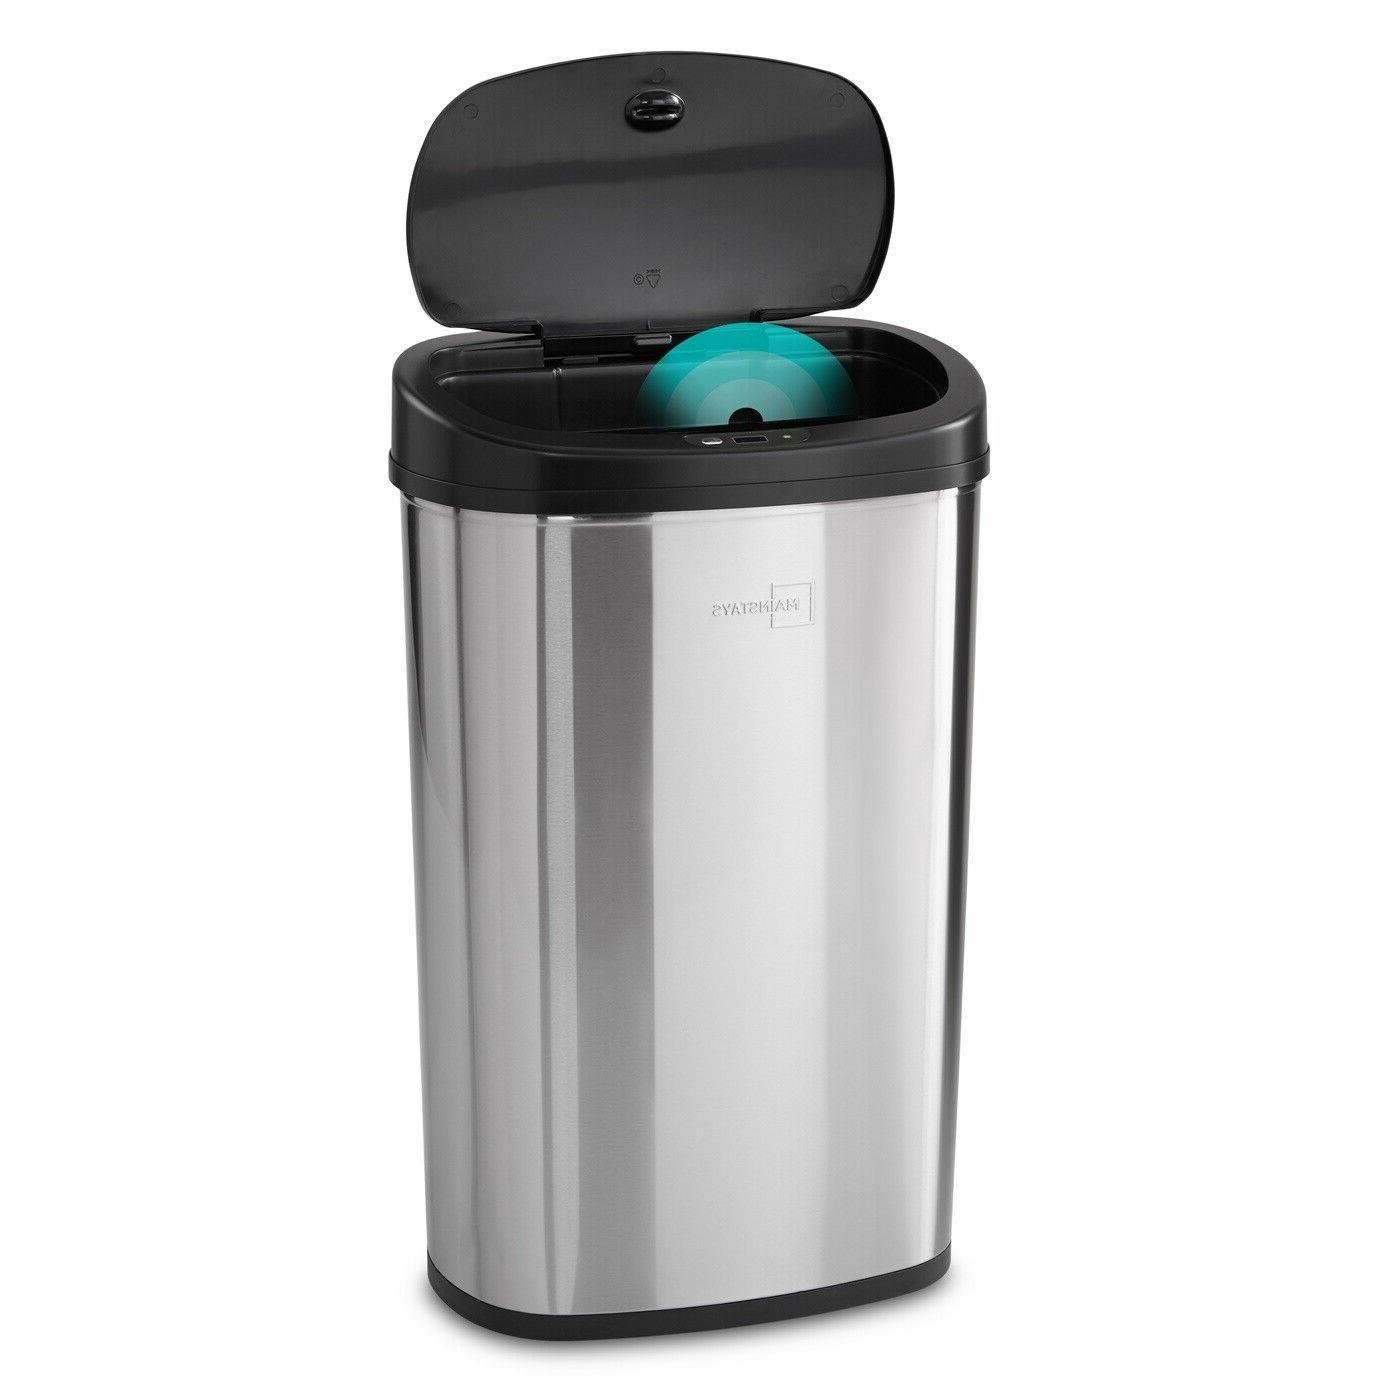 motion sensor trash can 13 gallon garbage